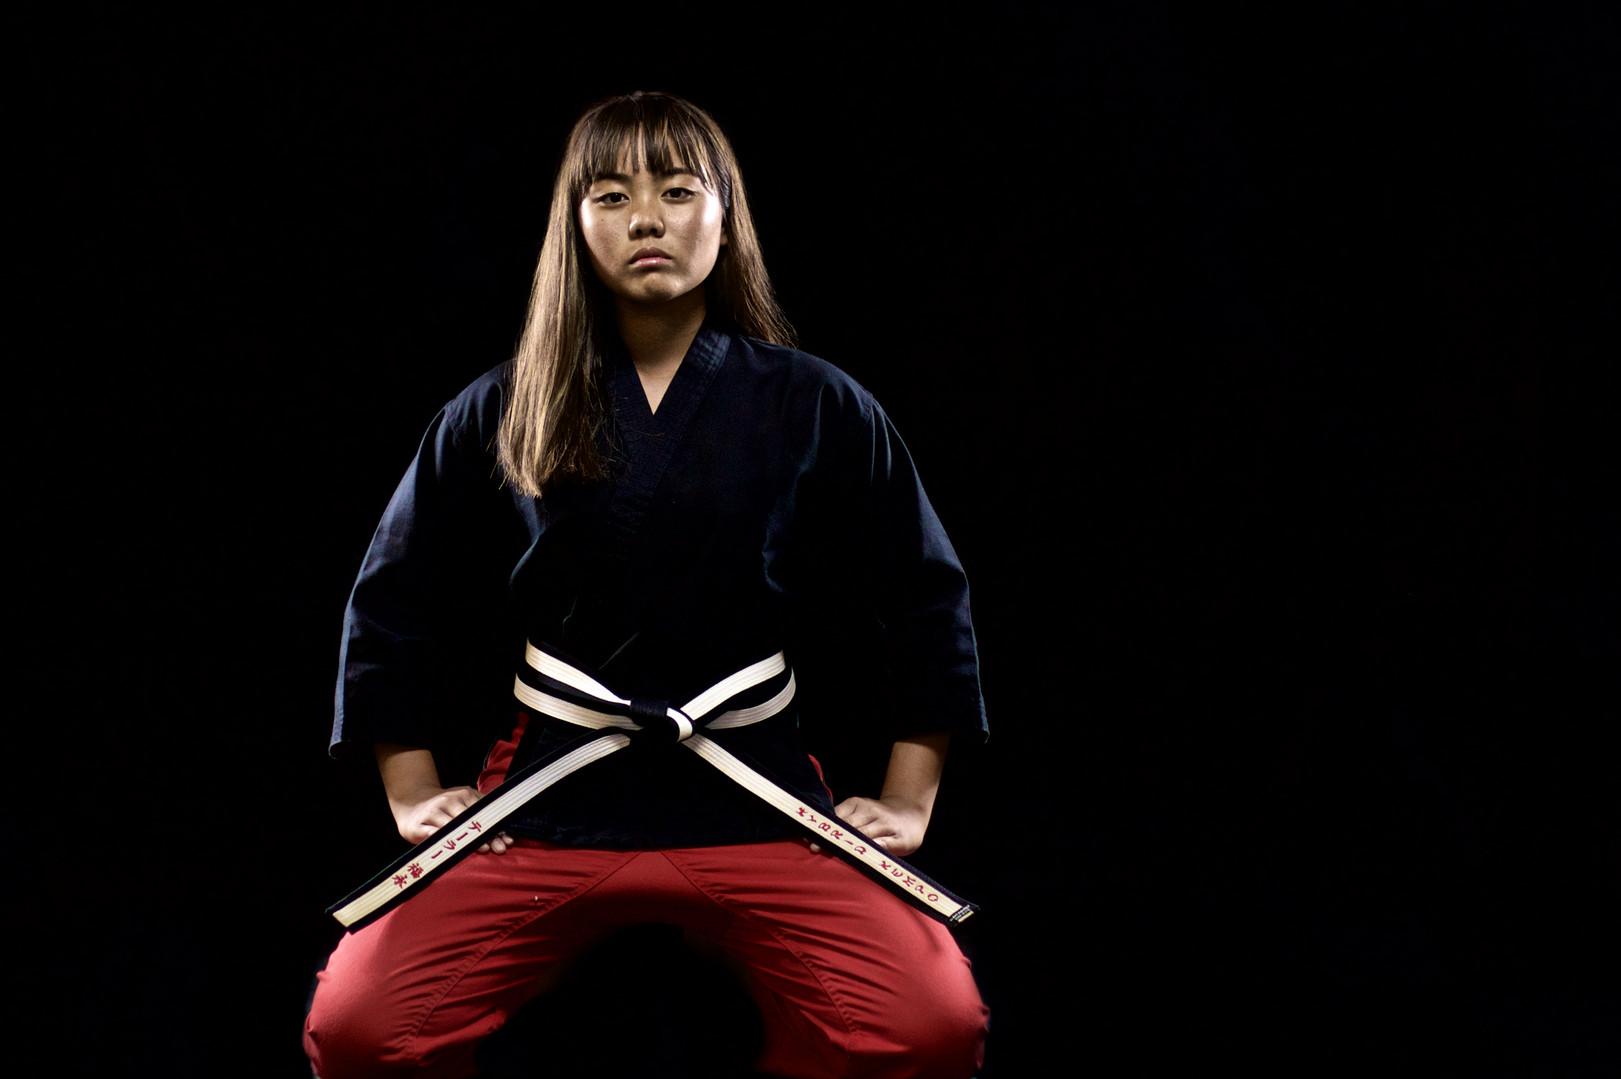 Karate: Taylor Fukunaga